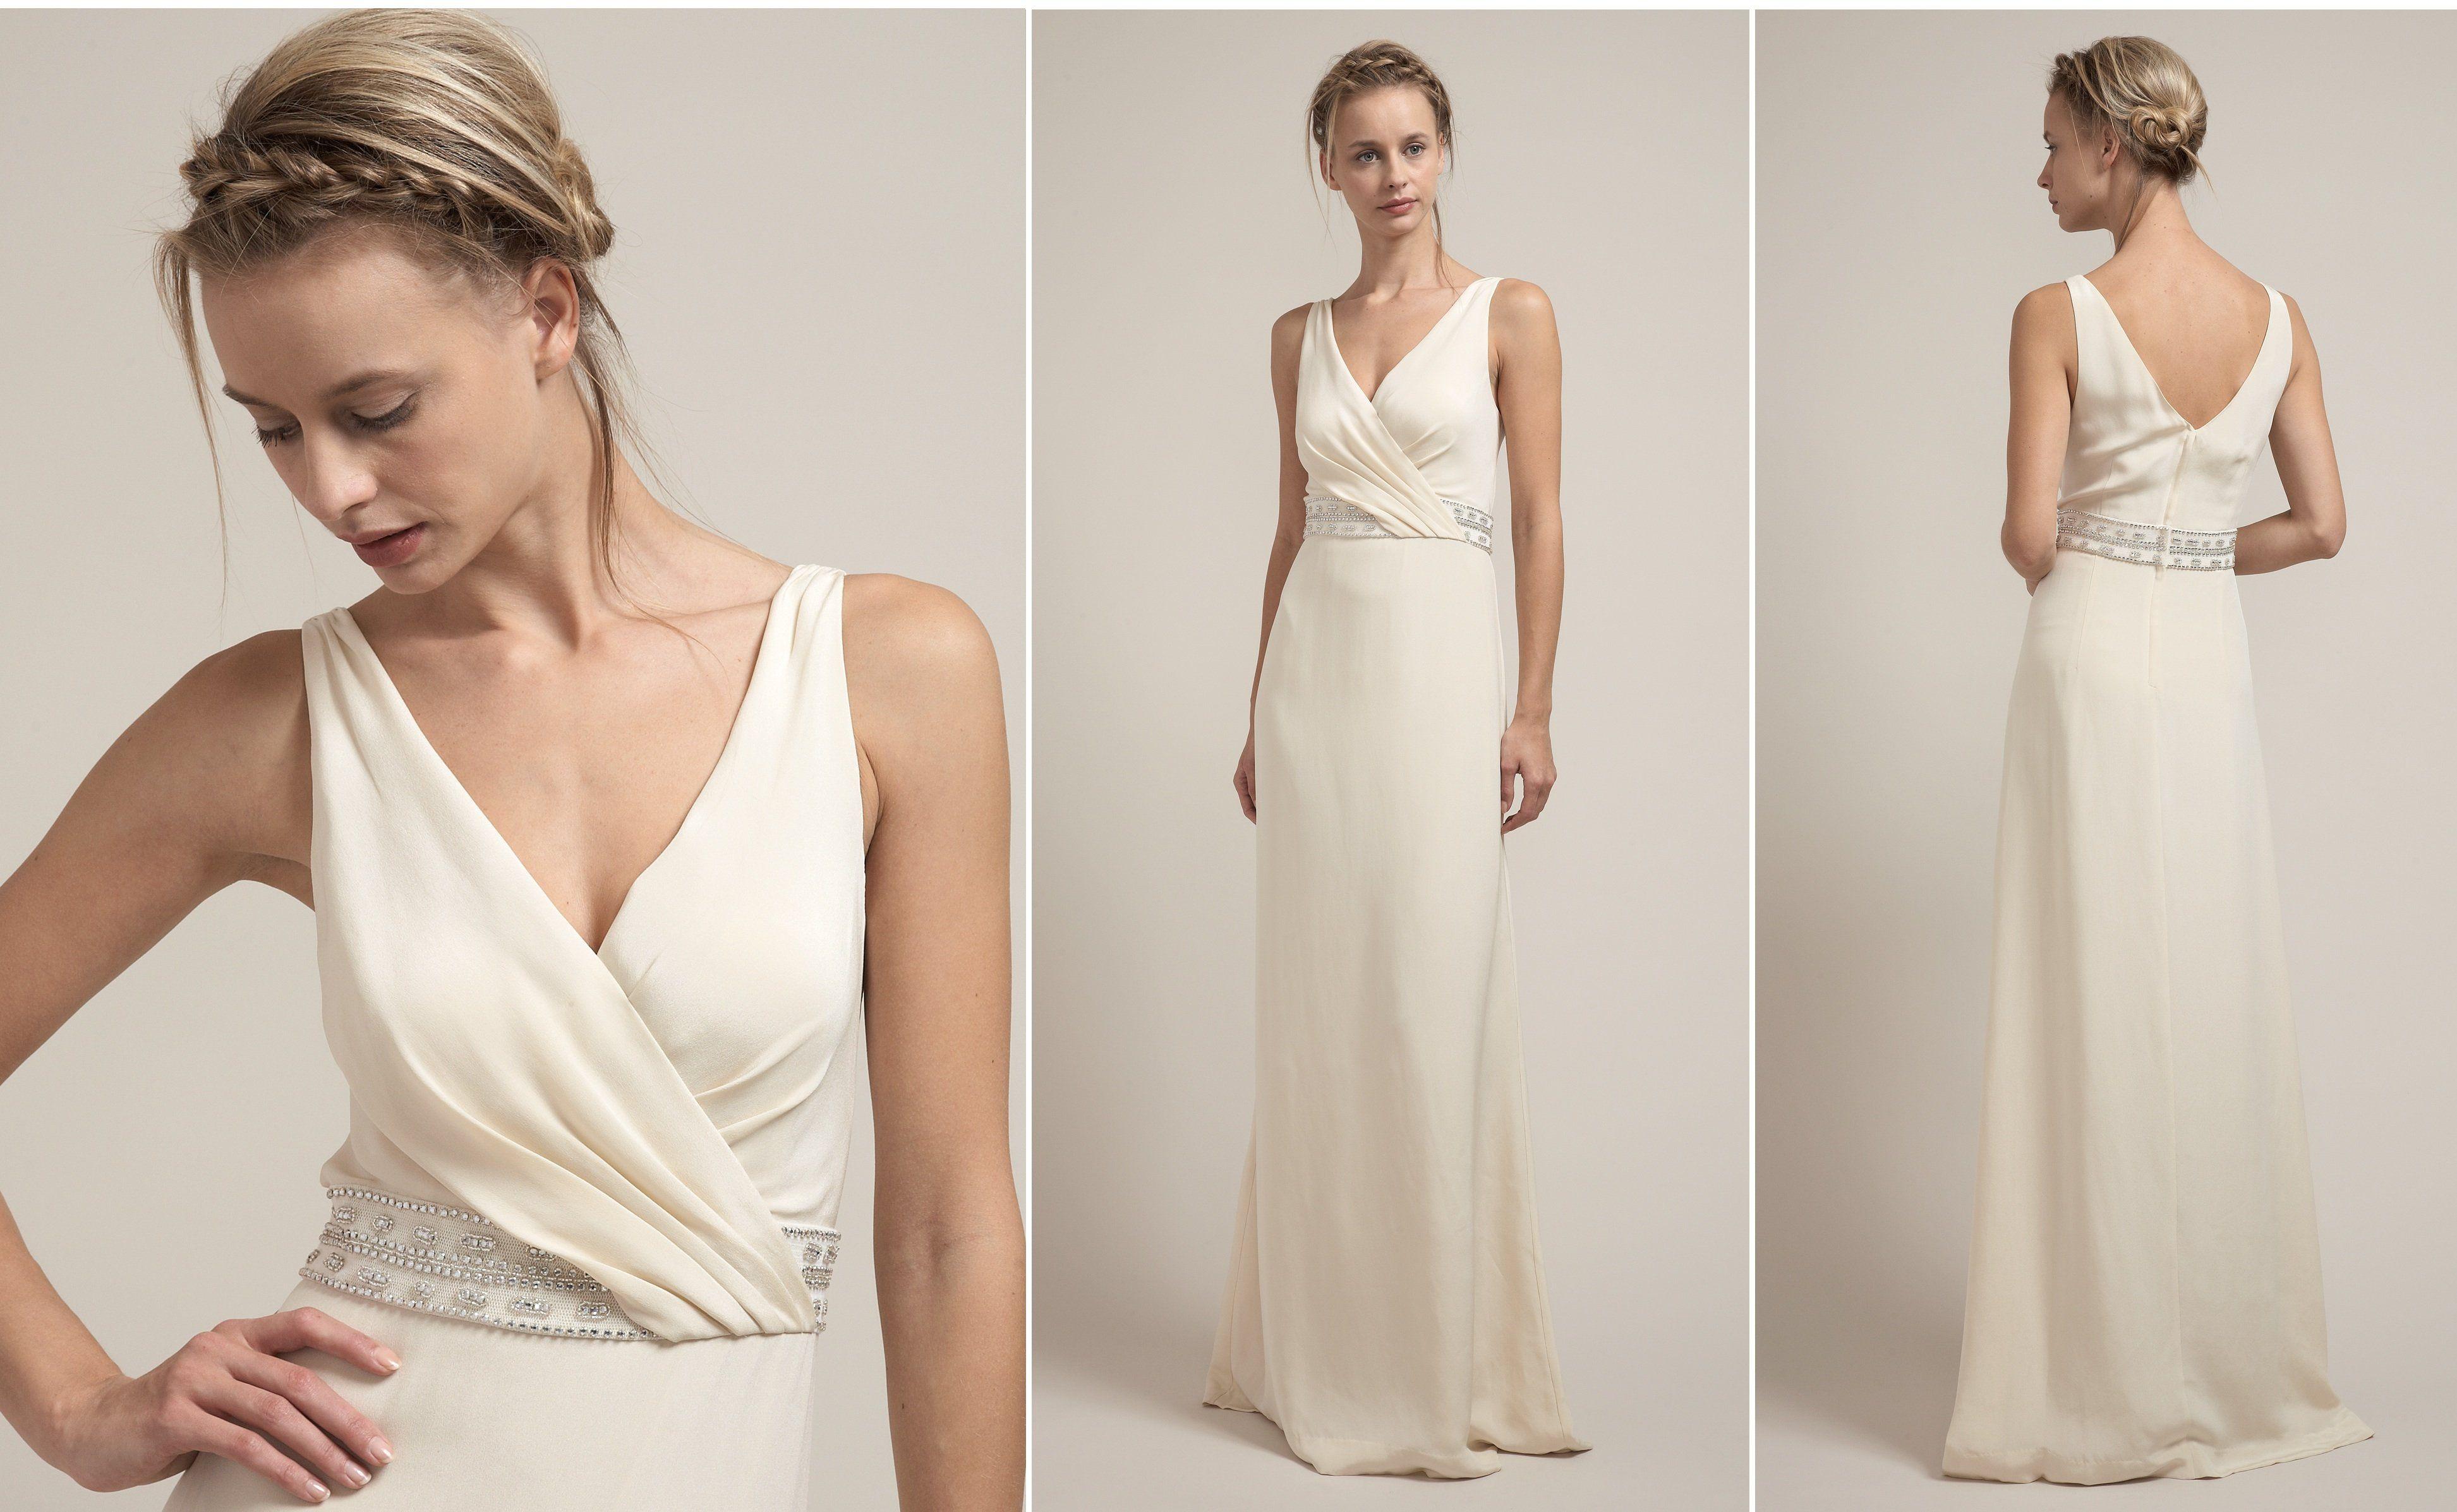 Rustic wedding gowns by saja rustic wedding gowns wedding dress